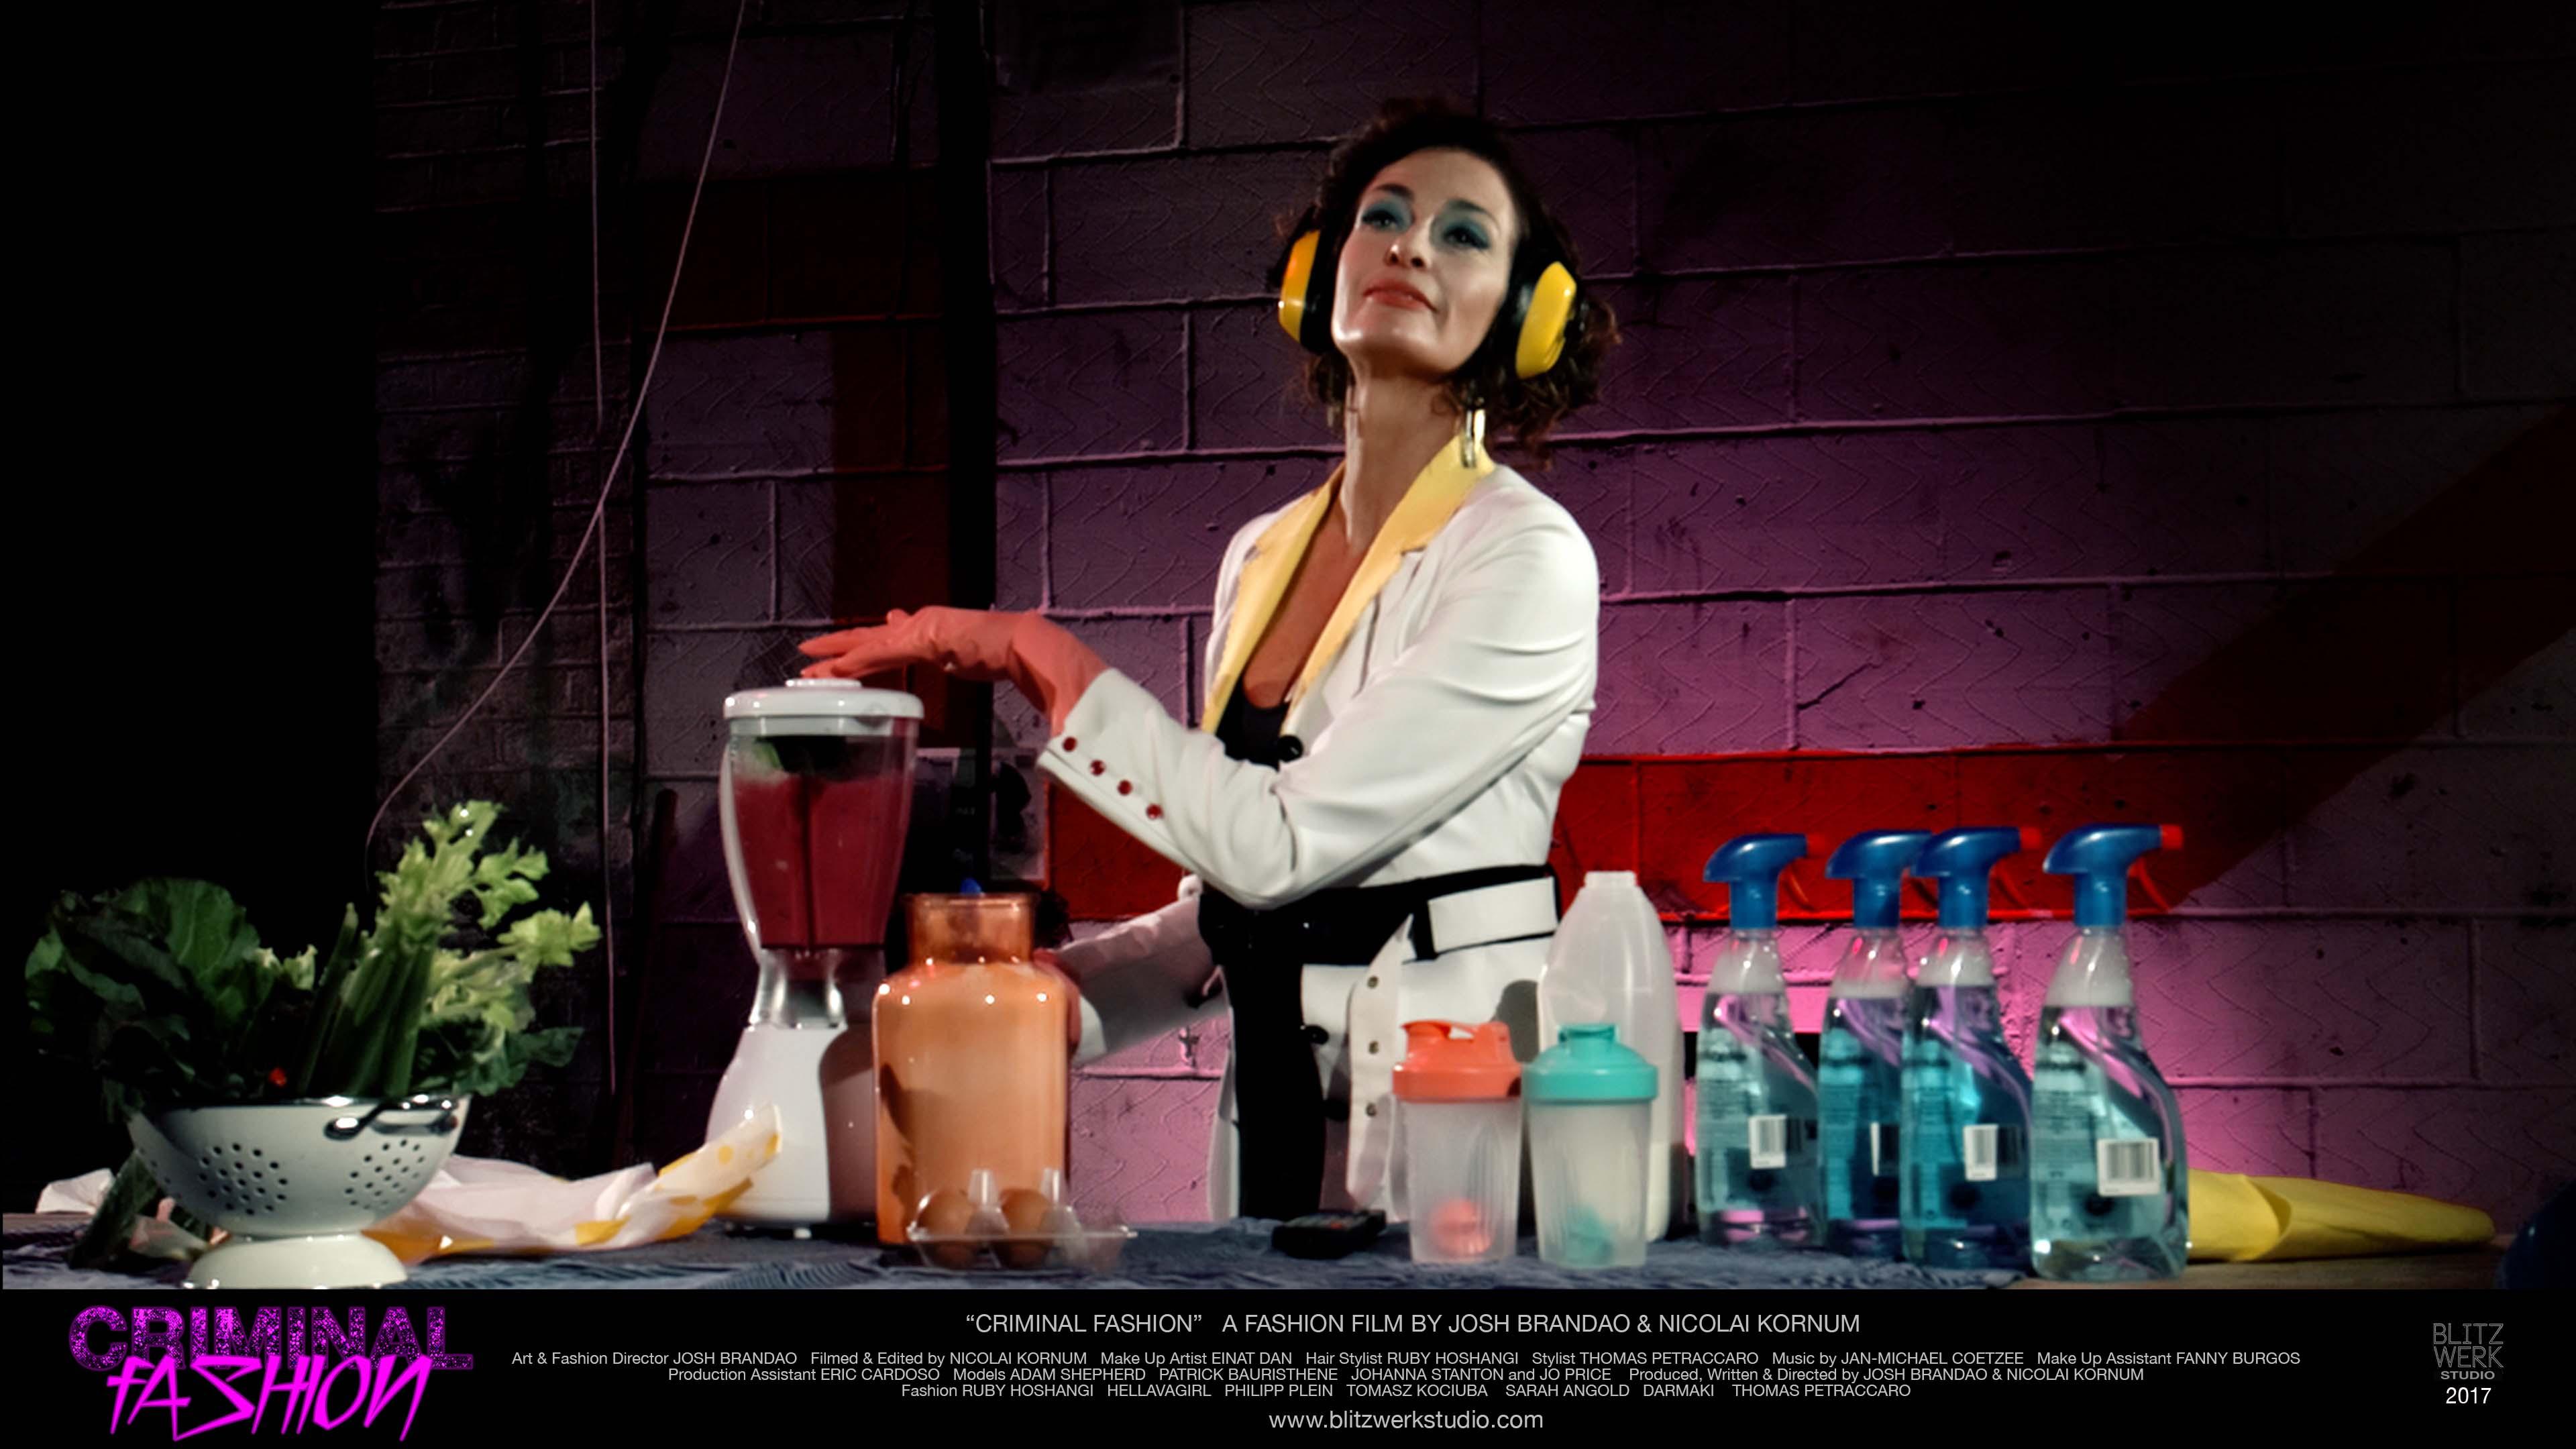 CRIMINAL FASHION PRODUCTION STILL (3))Jo Price by Blitzwerk studio